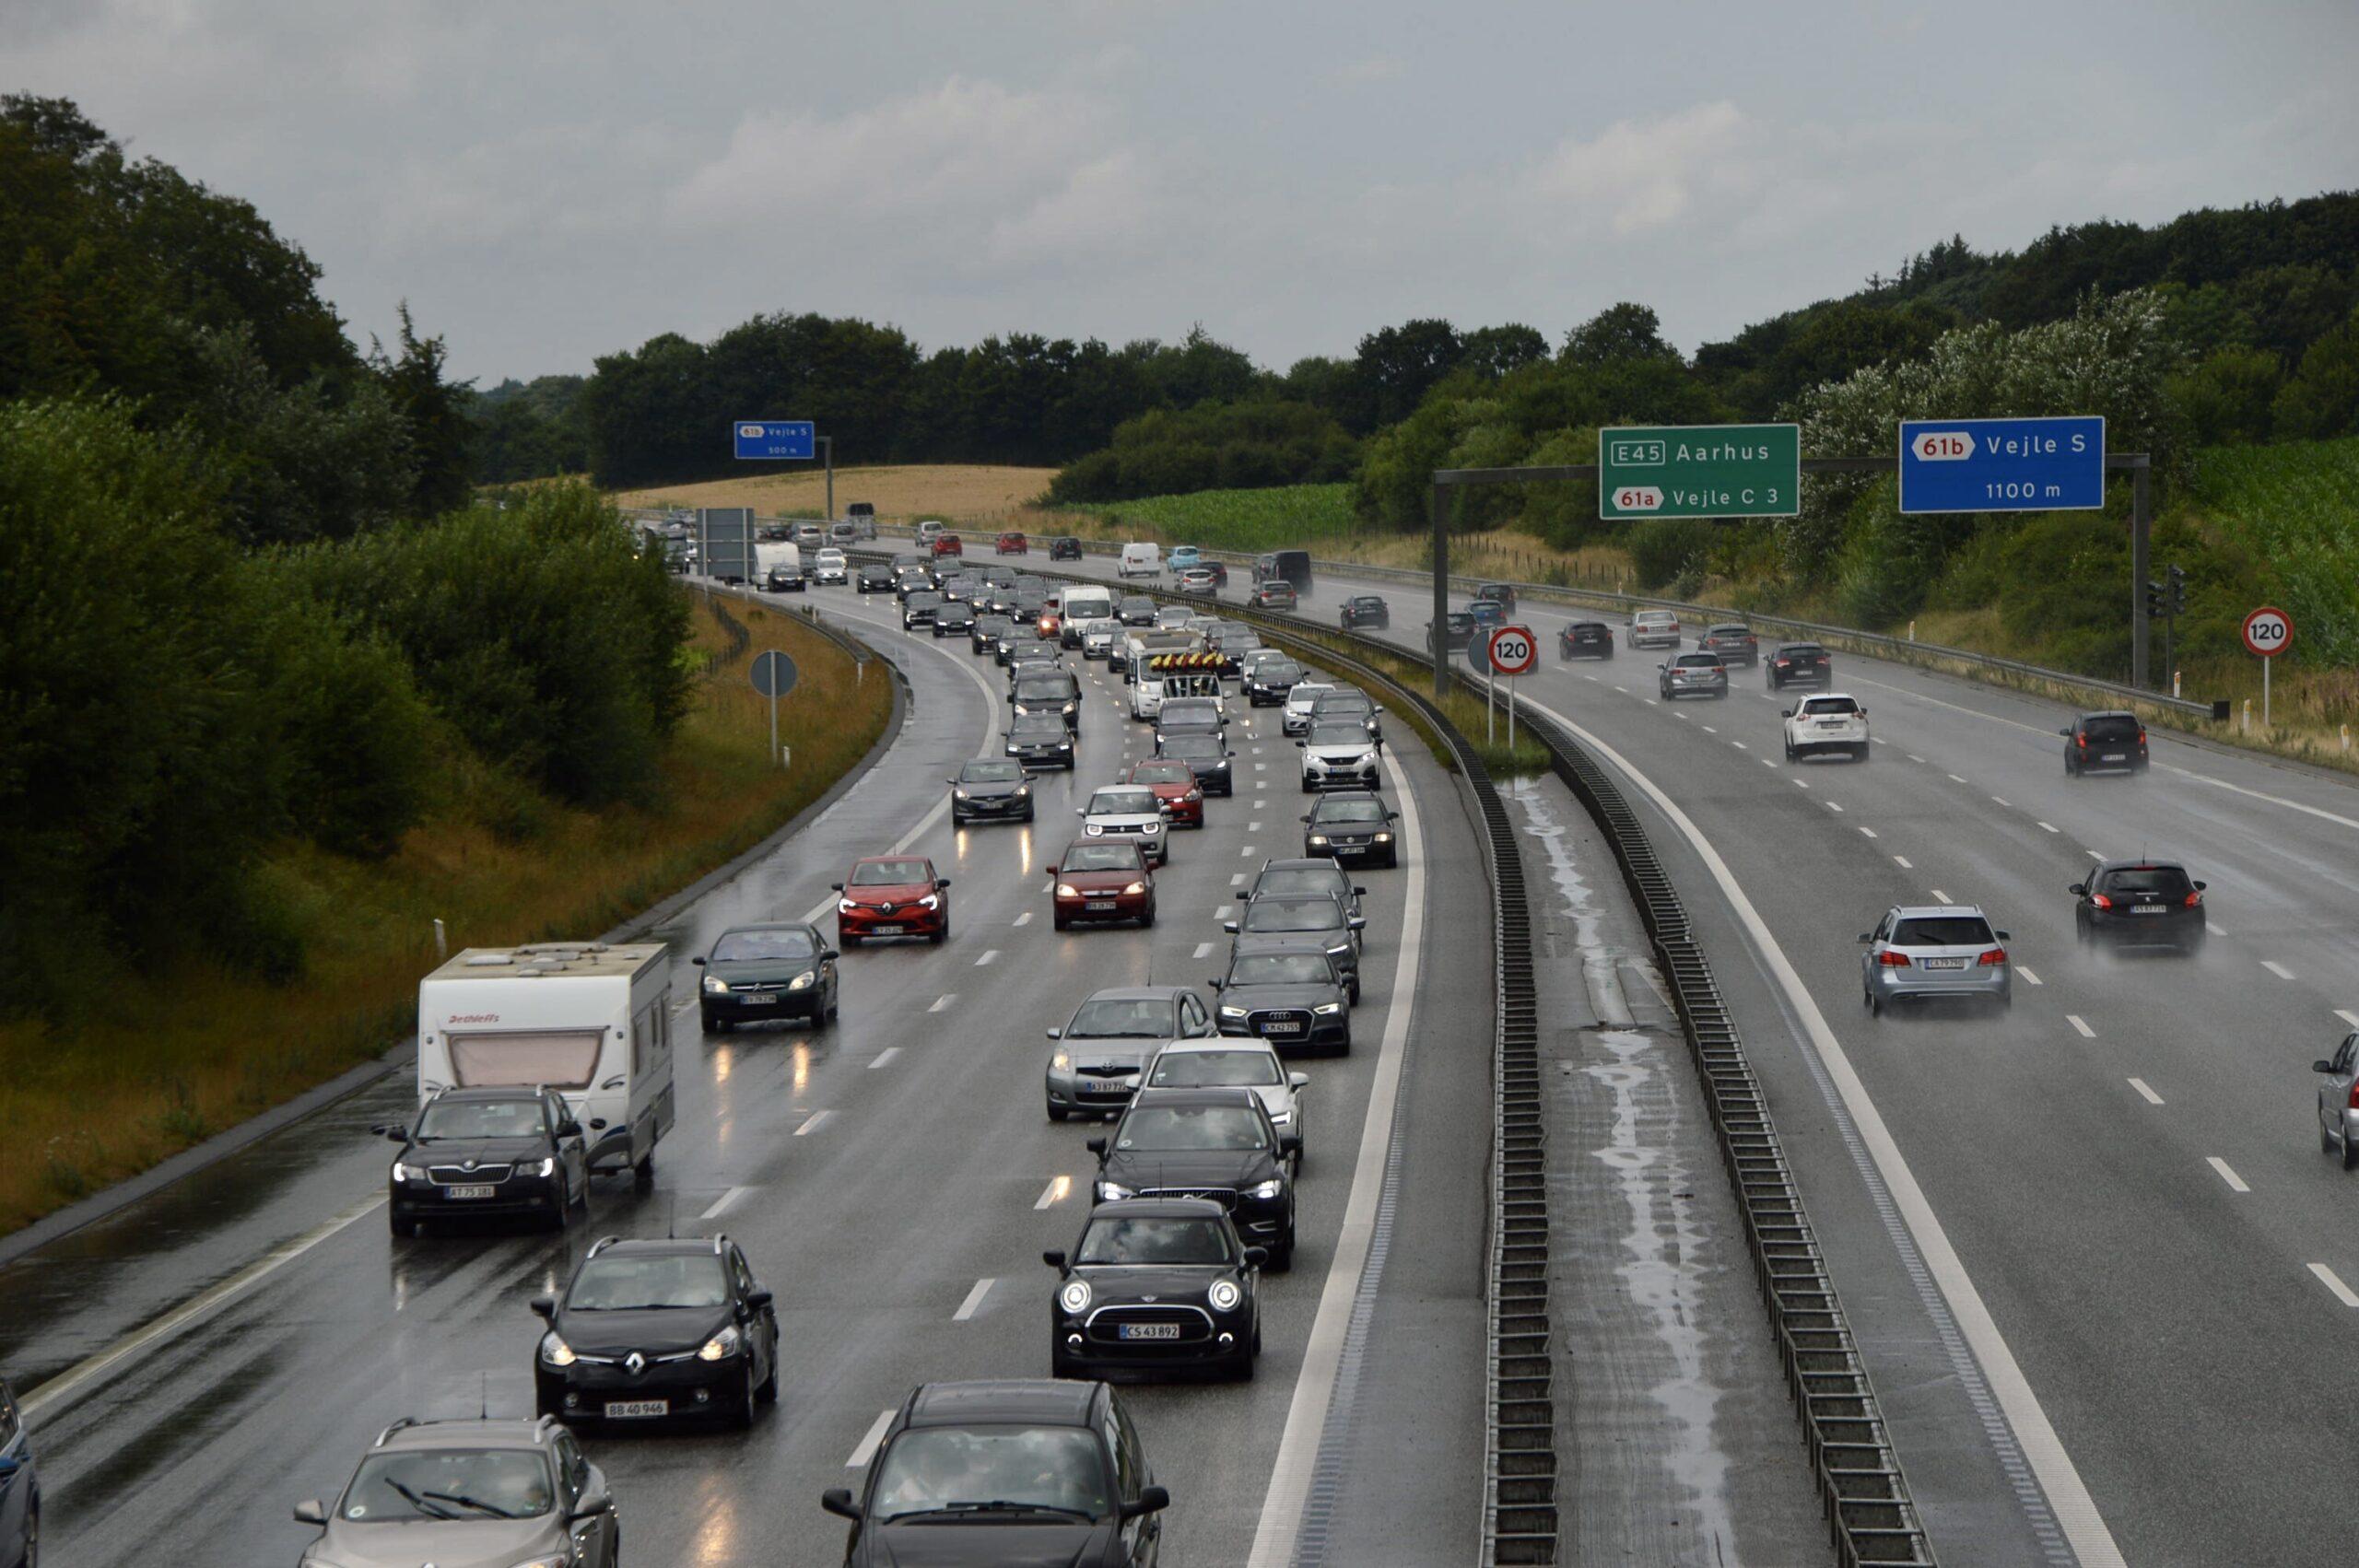 Større kø på sønderjyskemotorvej efter uheld